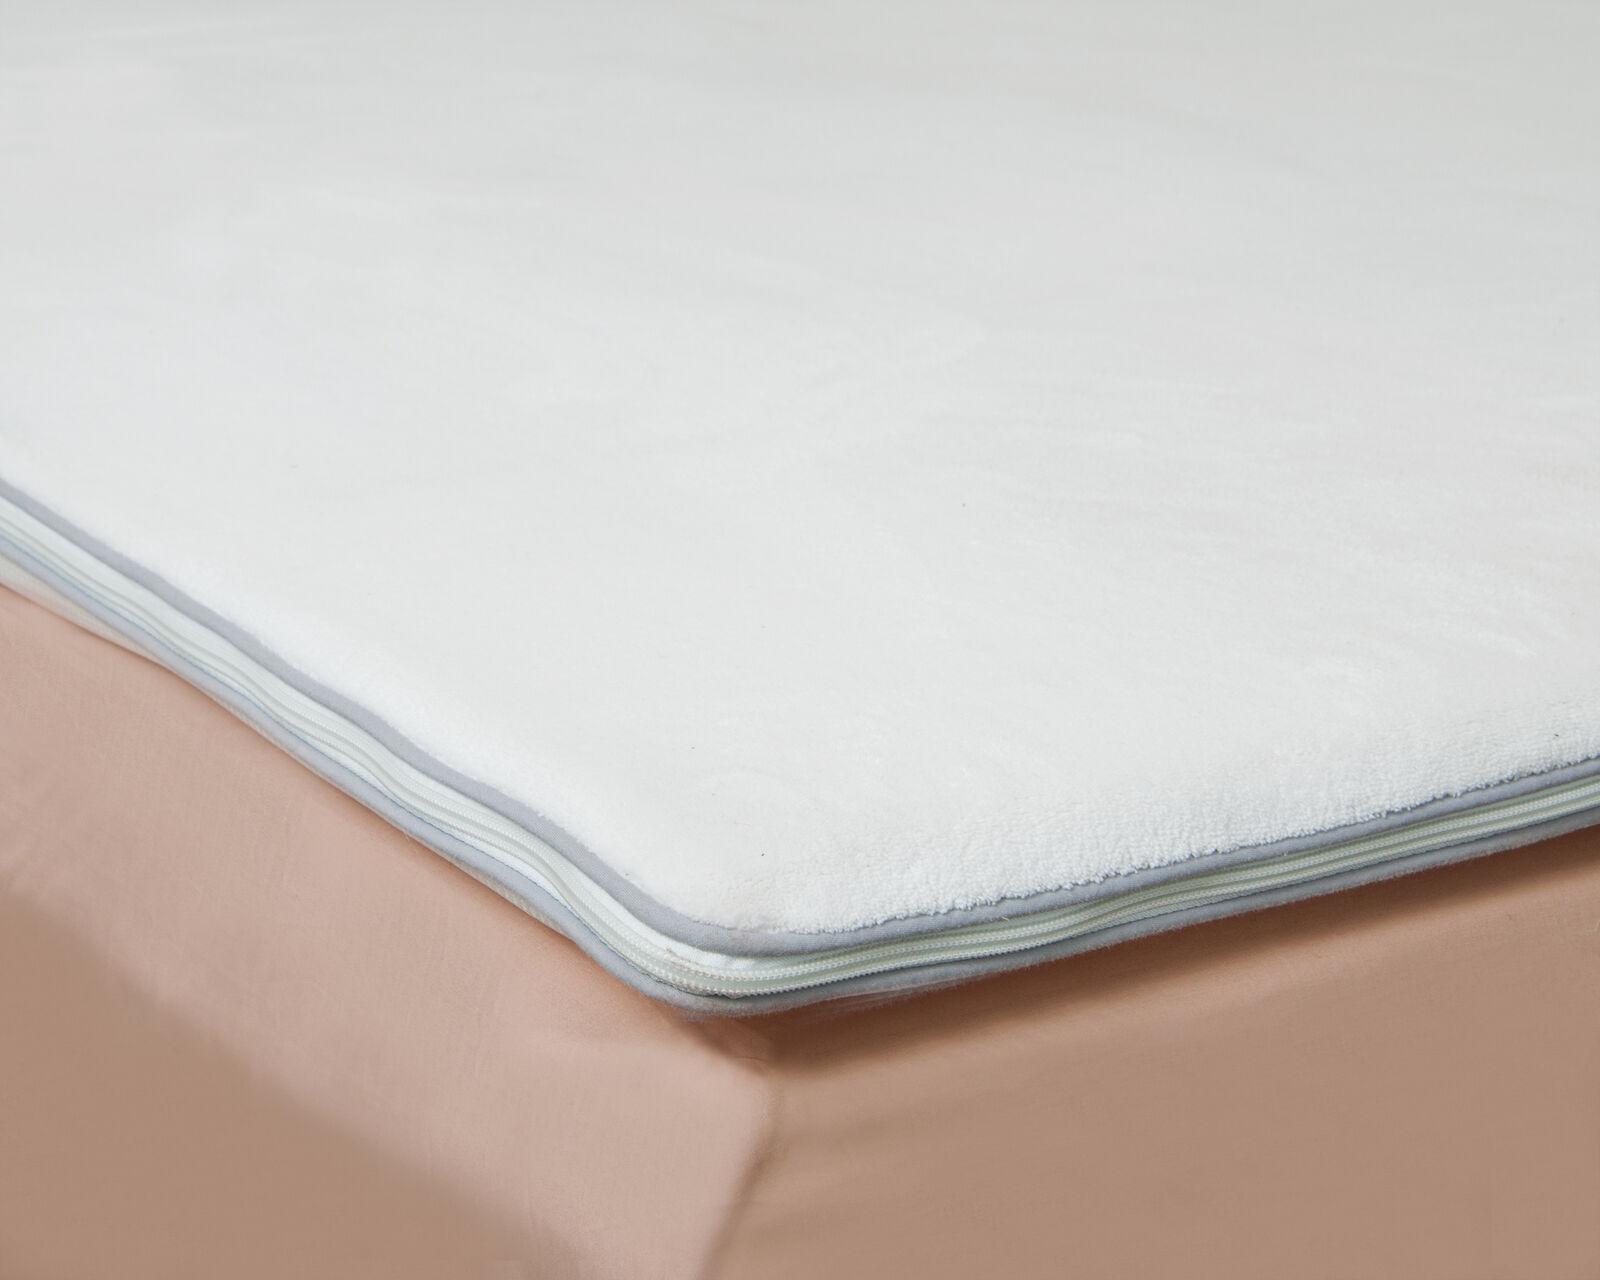 All Seasons Luxury Air Relax And Polar Fleece Memory Foam Mattress Topper Cover